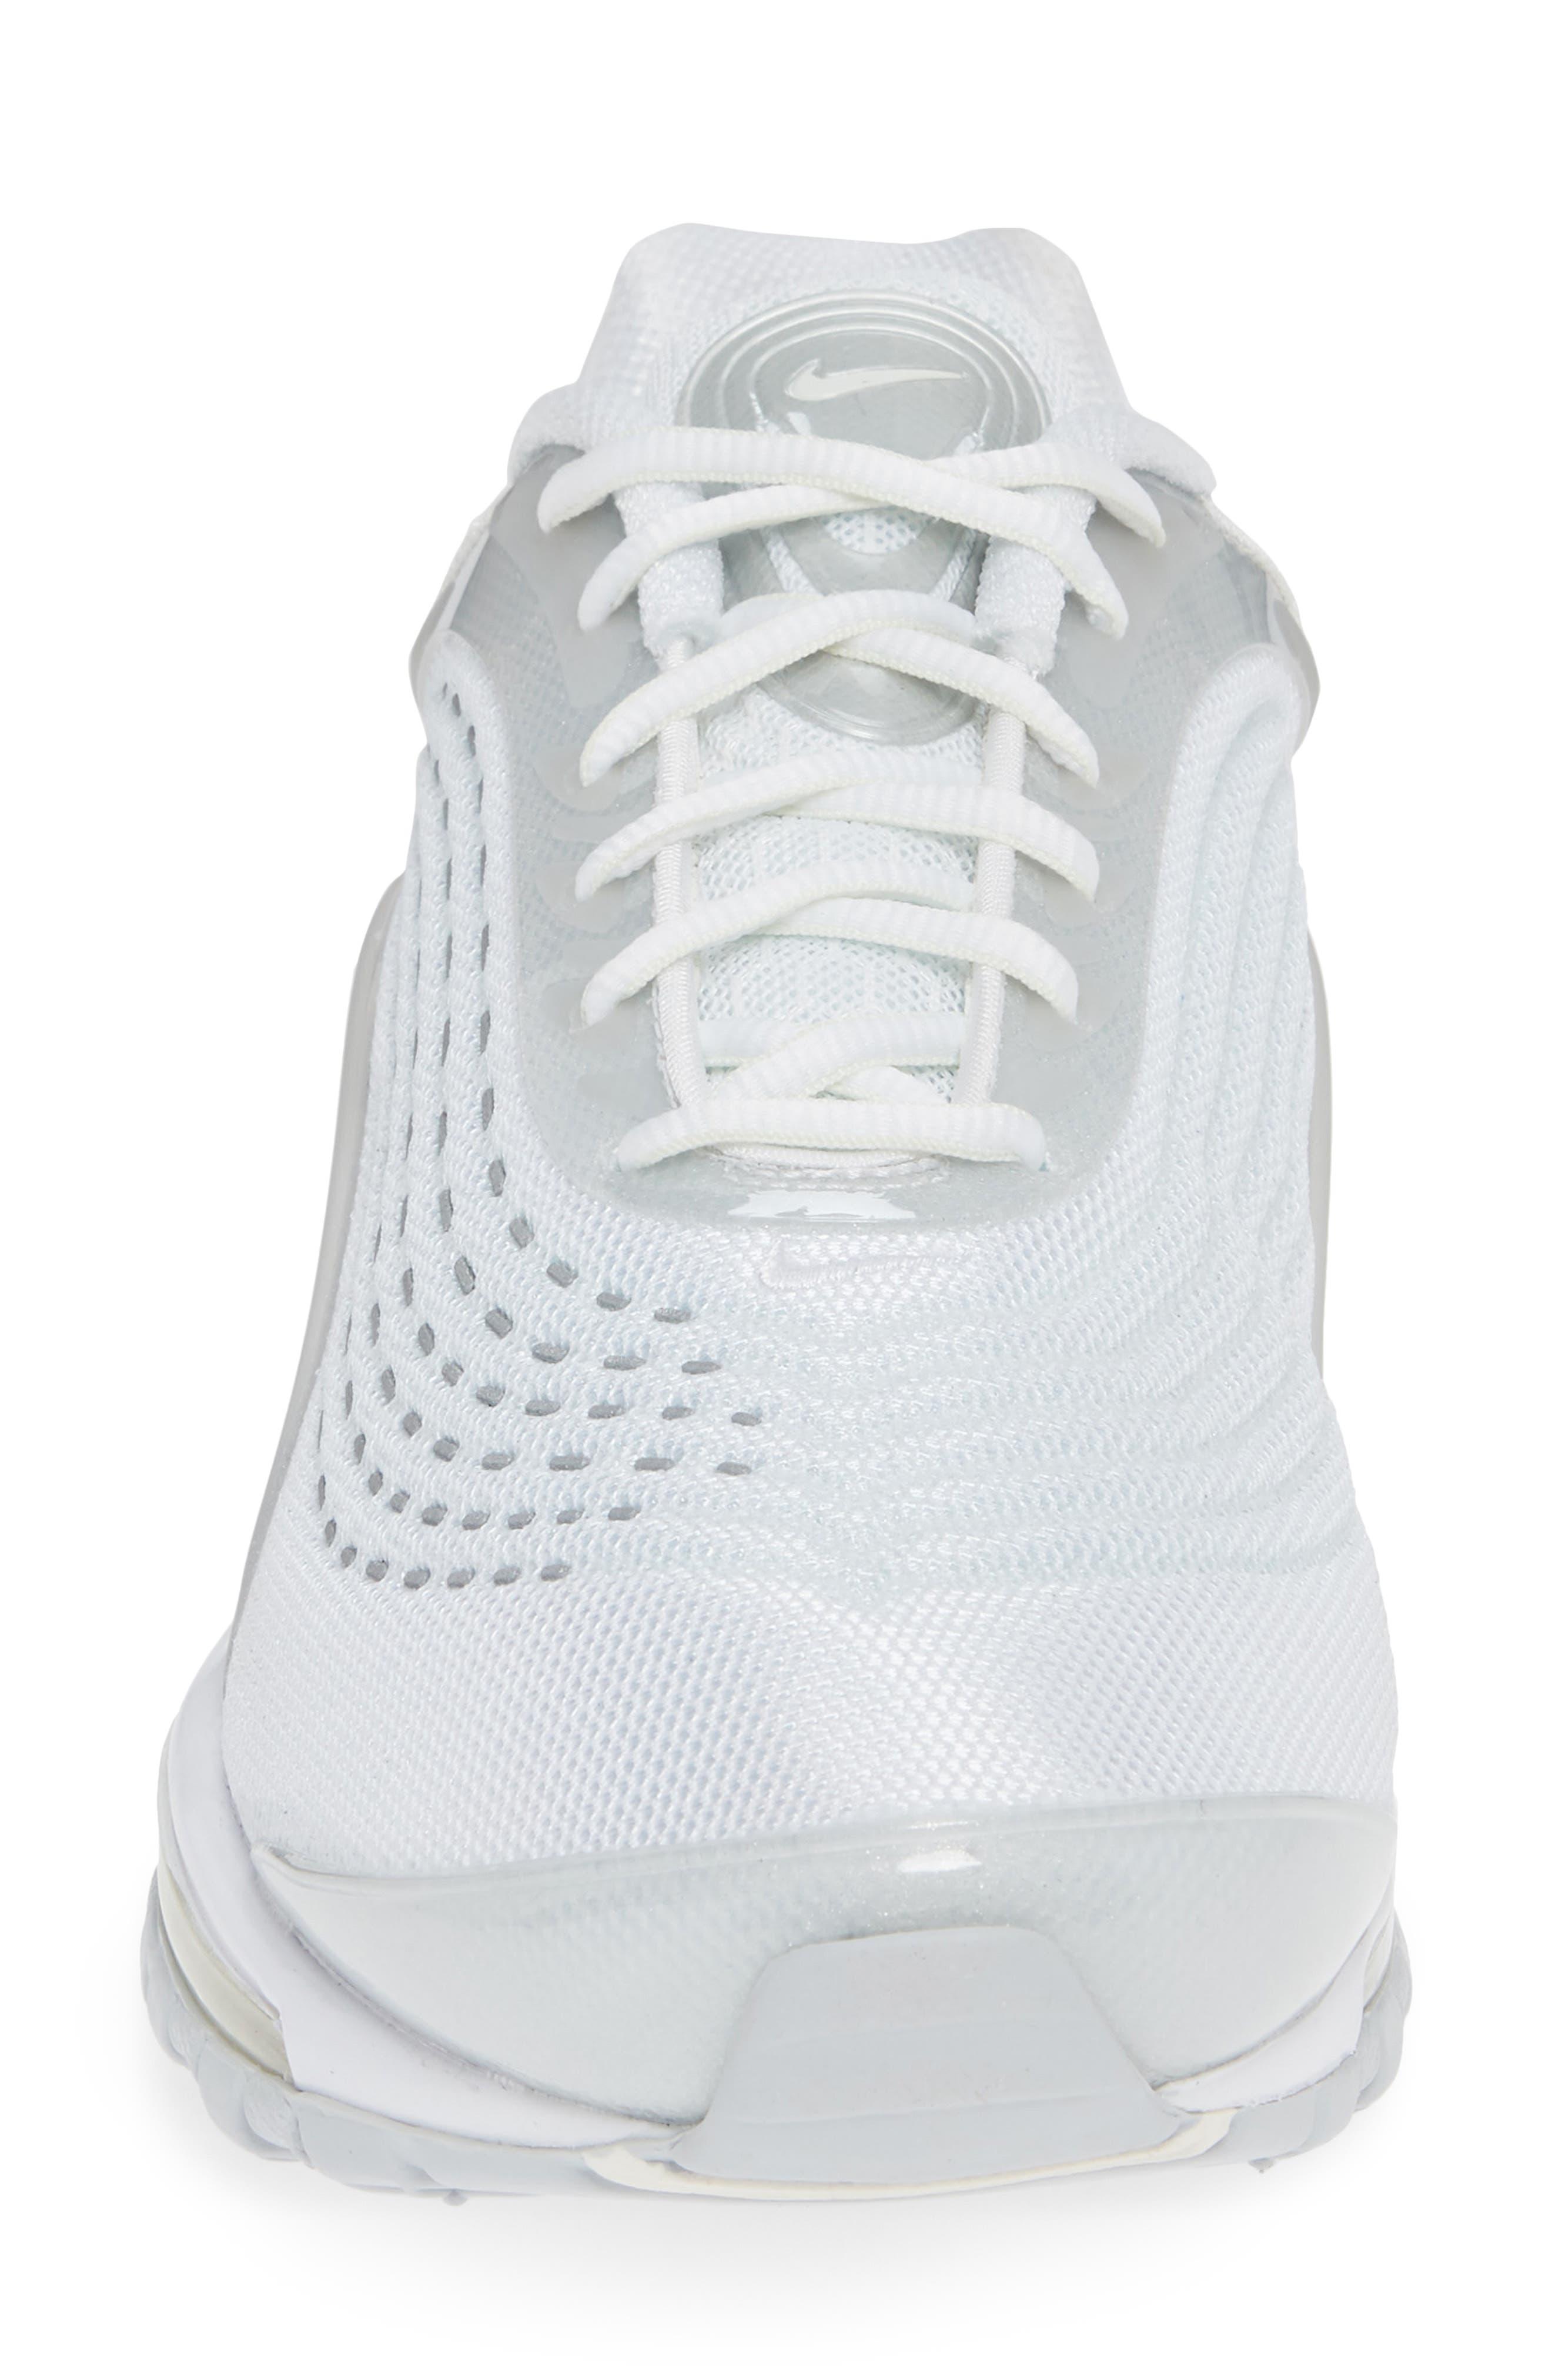 NIKE,                             Air Max Deluxe Sneaker,                             Alternate thumbnail 4, color,                             WHITE/ SAIL/ PURE PLATINUM